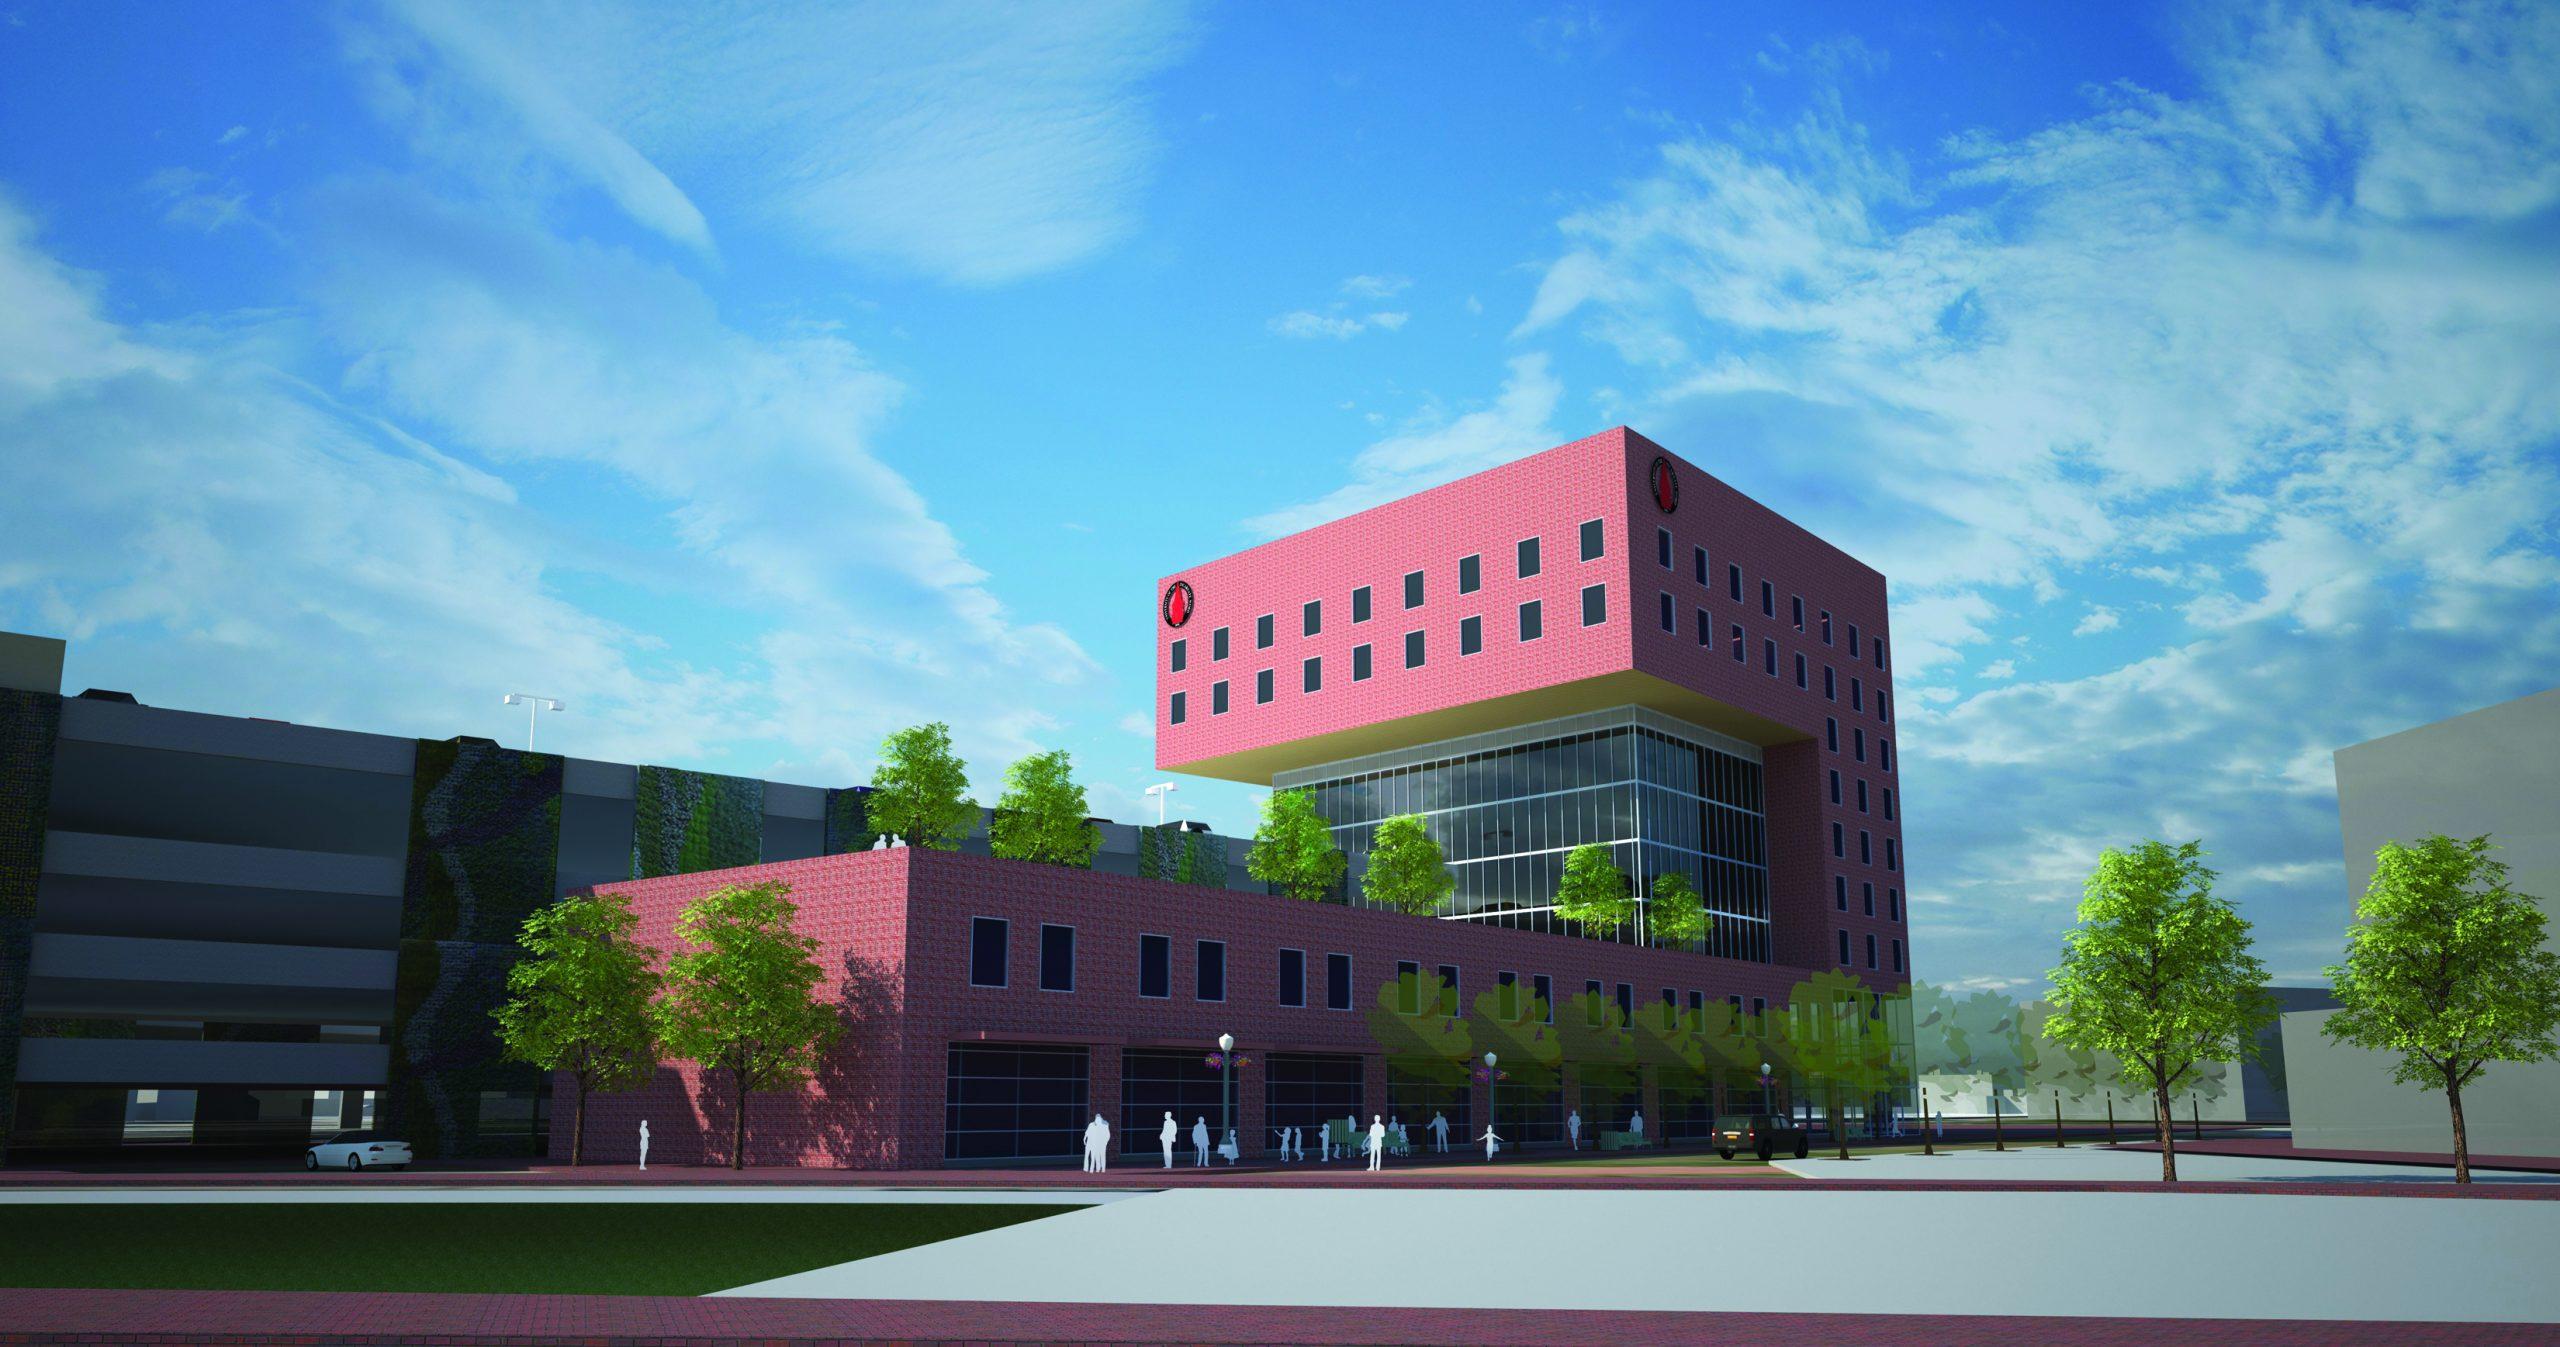 Rendering of the proposed medical school. Courtesy of Centro Partnership San Antonio..